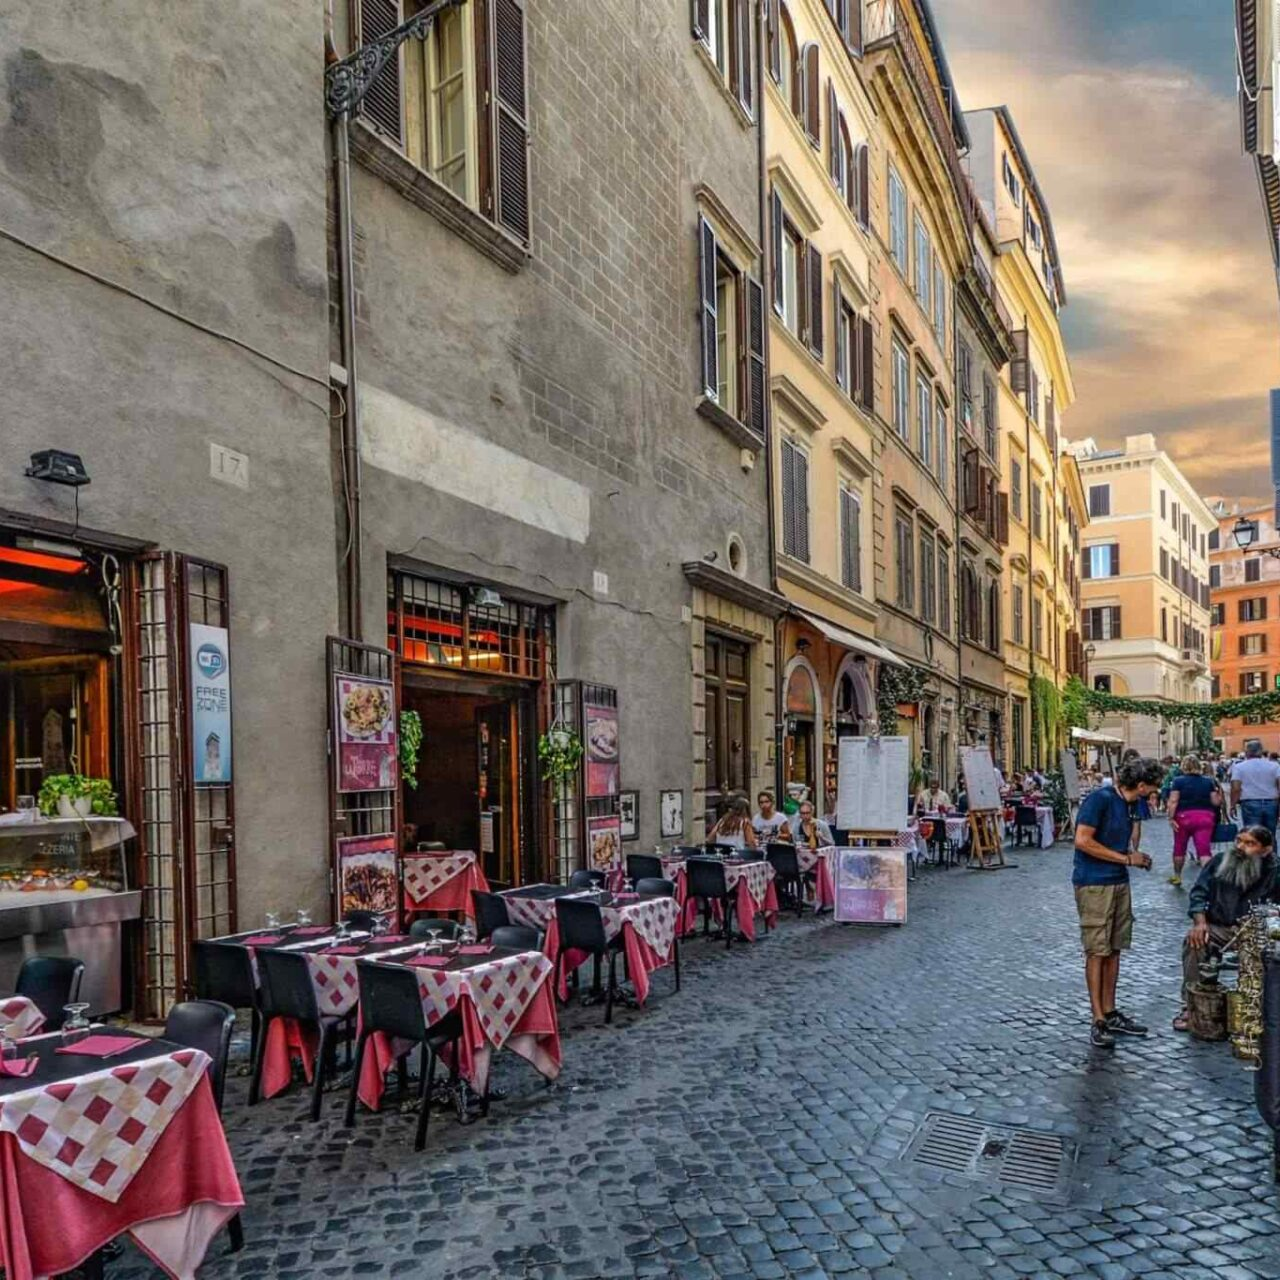 https://bbqterkep.hu/wp-content/uploads/2017/10/restaurant-italian-6-1280x1280.jpg